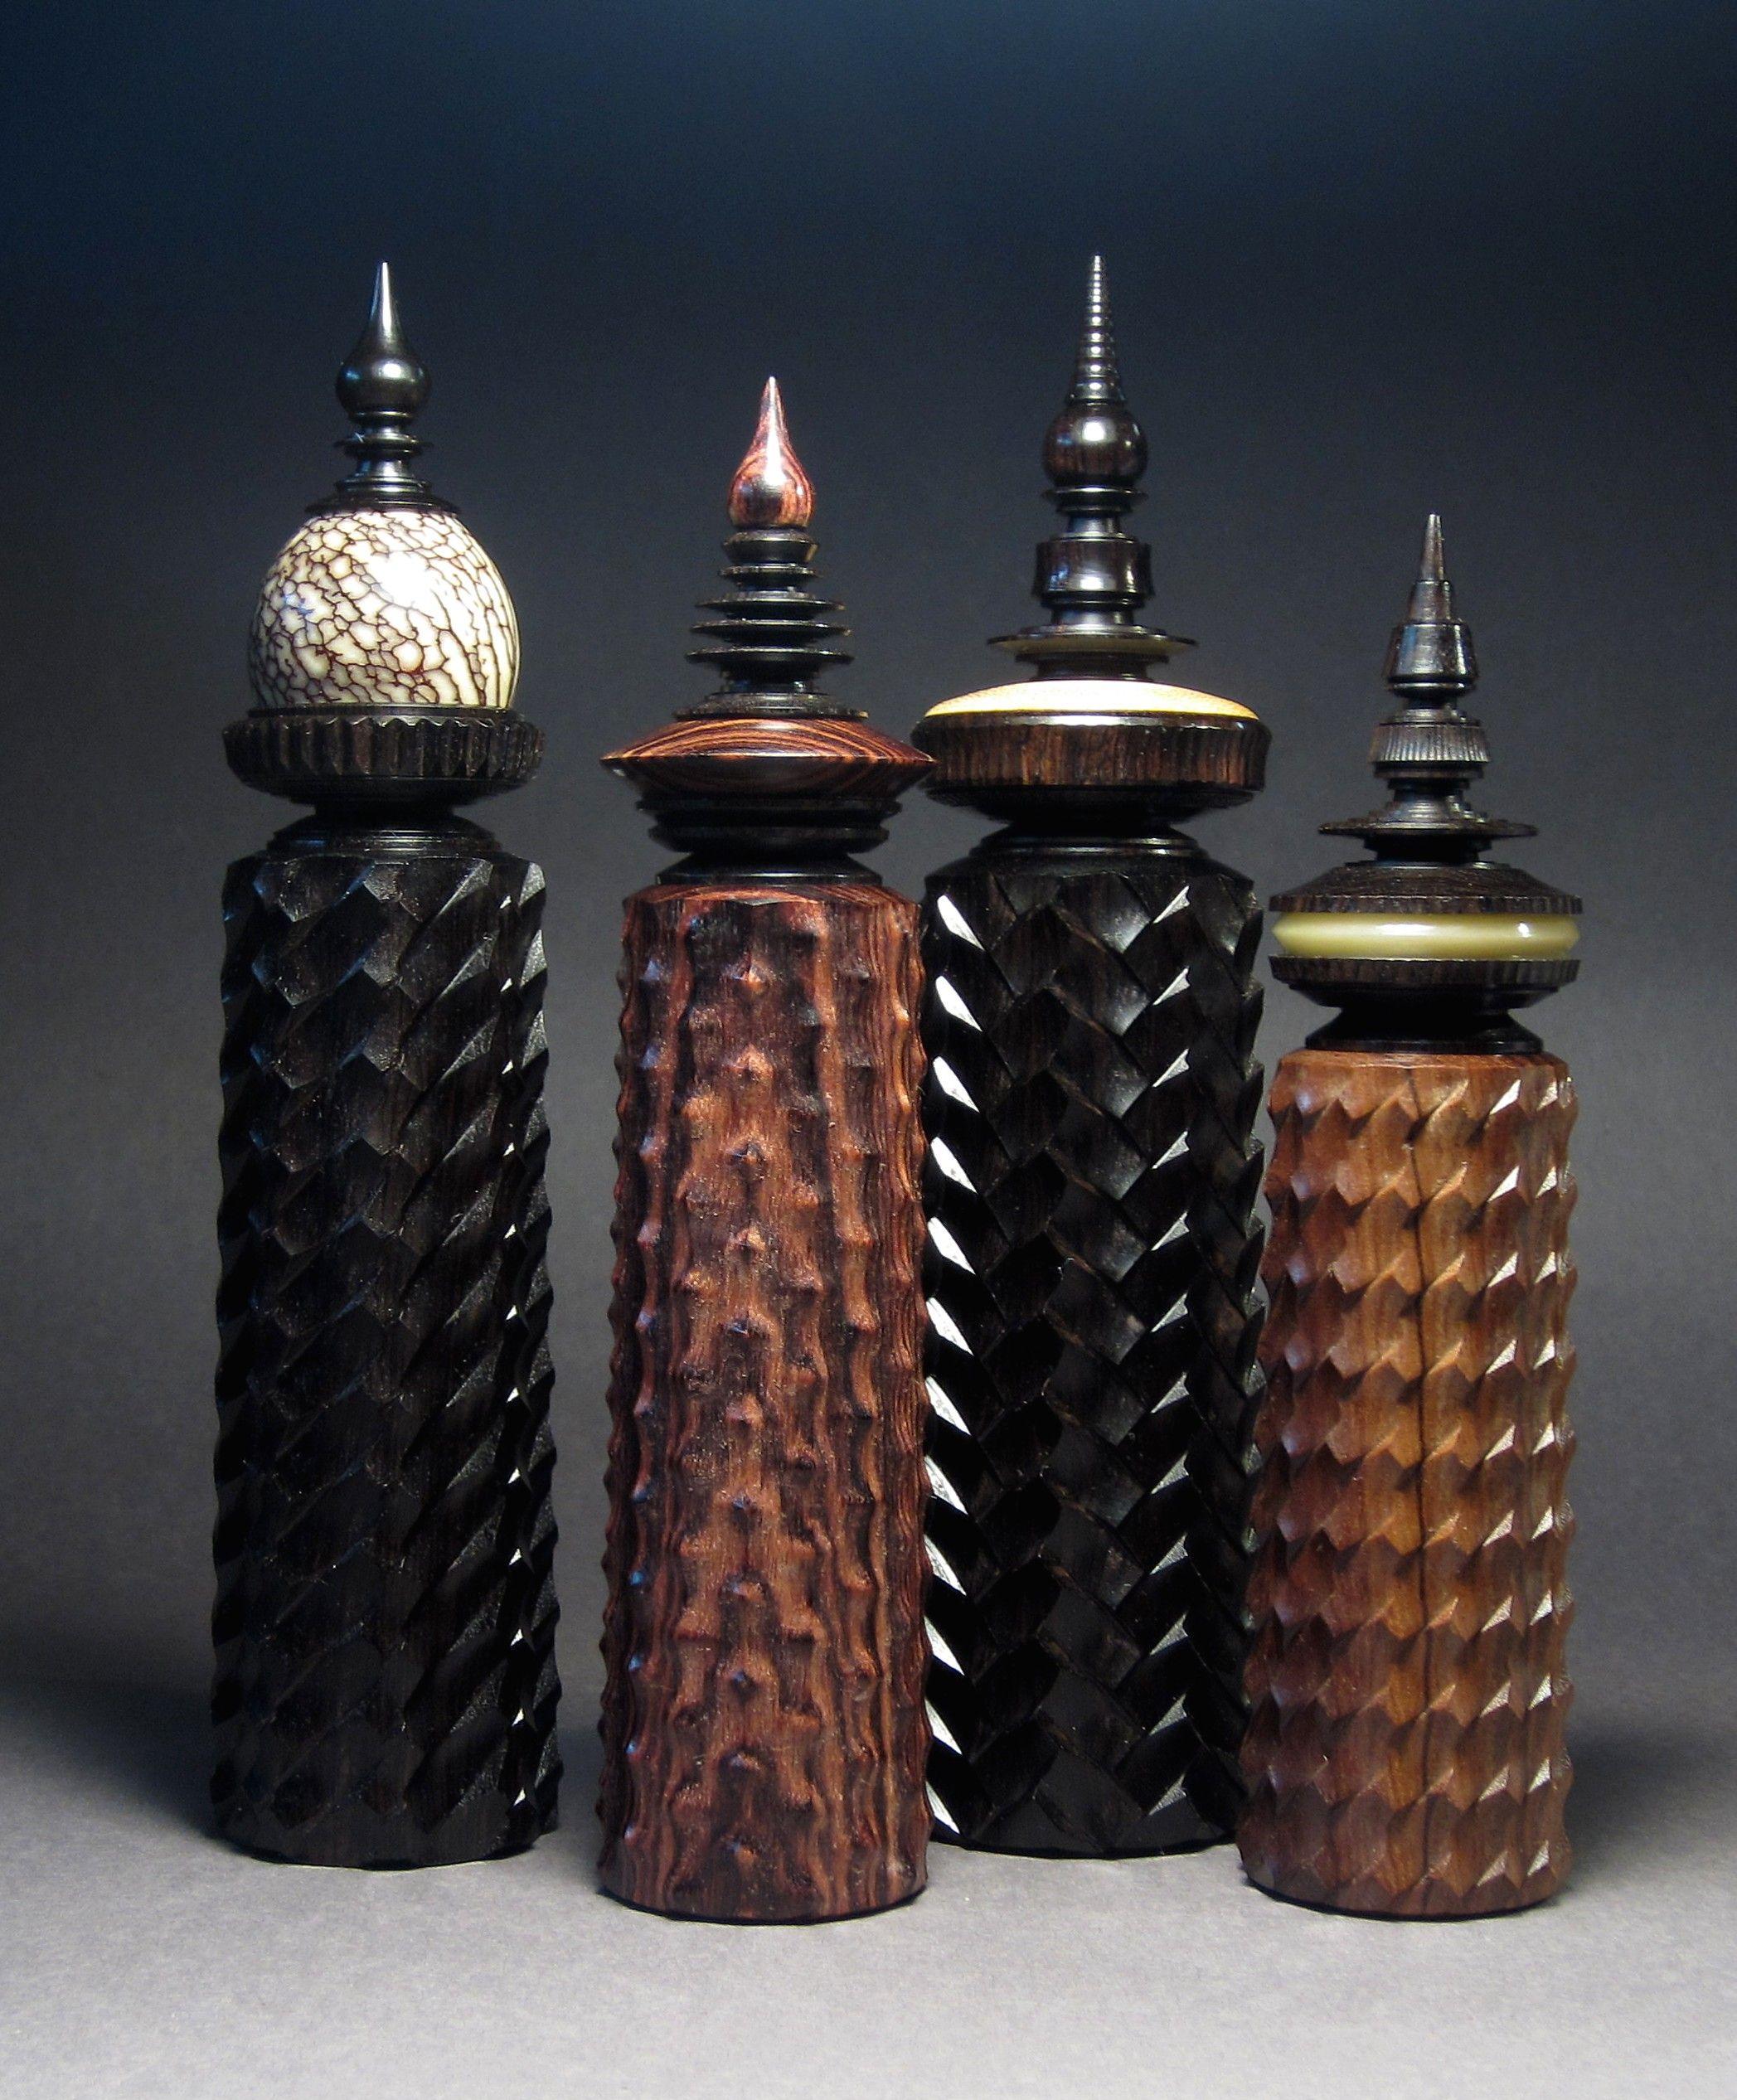 Ornamental bottles - 4 Ornamental Turned Bottles By Jon Sauer Js